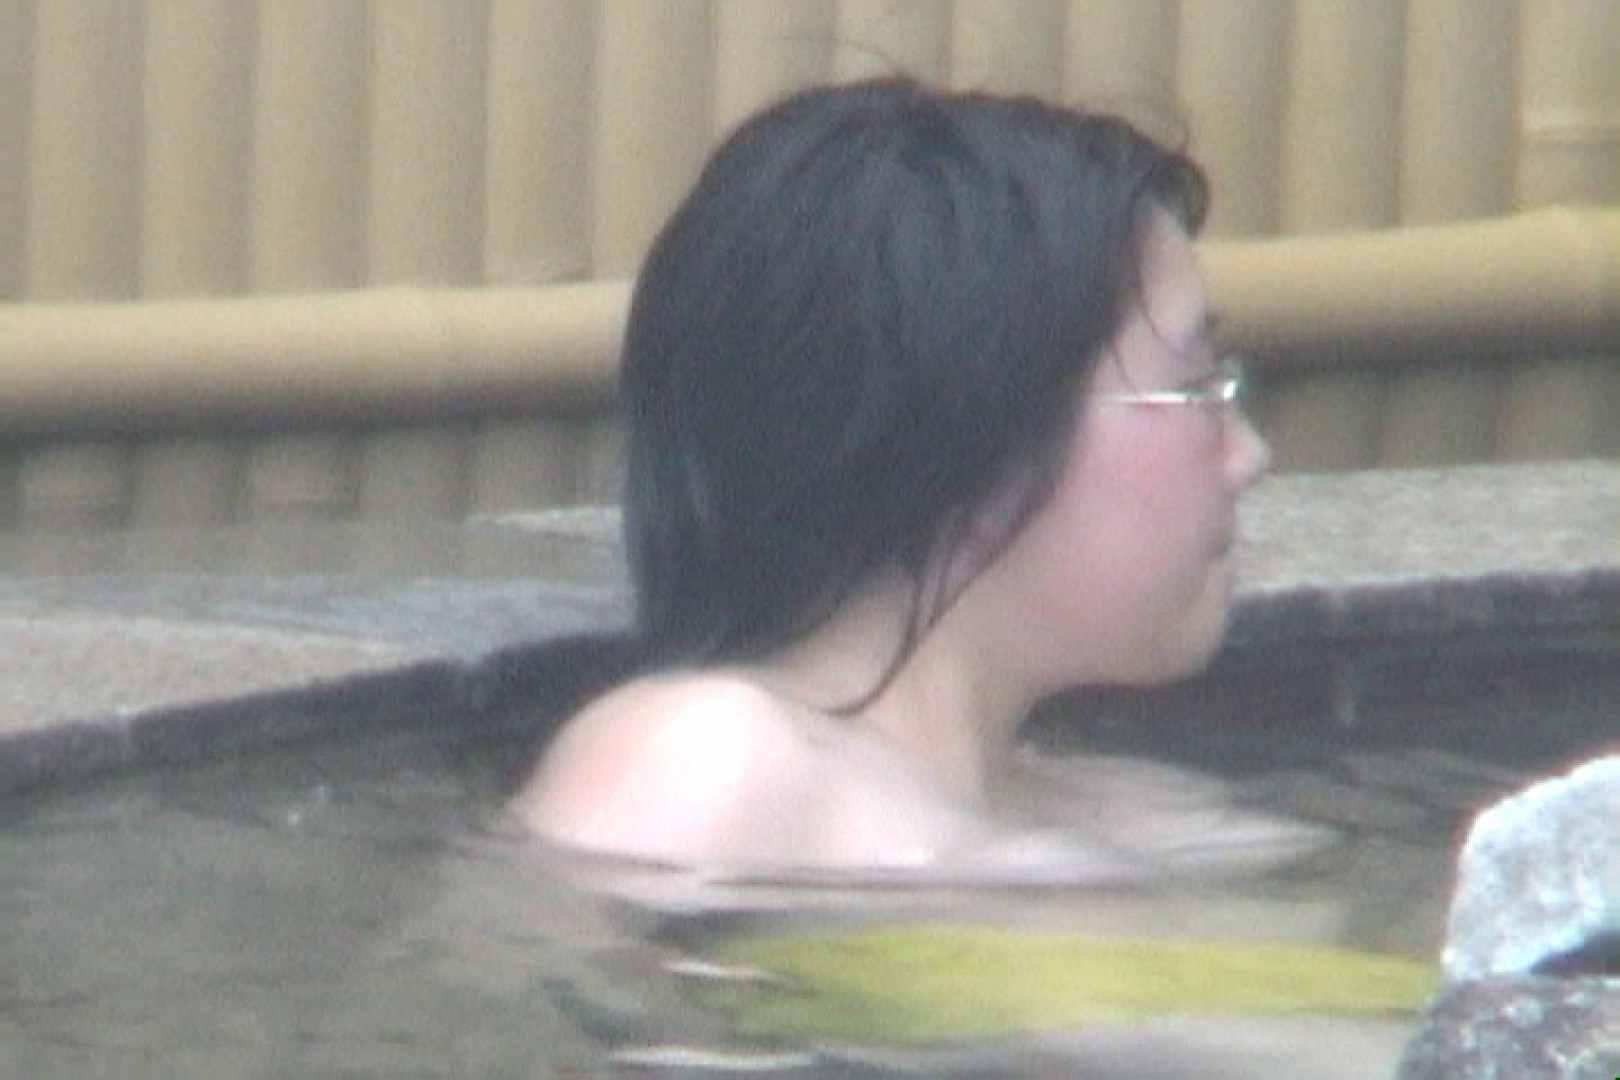 Aquaな露天風呂Vol.46【VIP限定】 HなOL | 露天  90pic 20